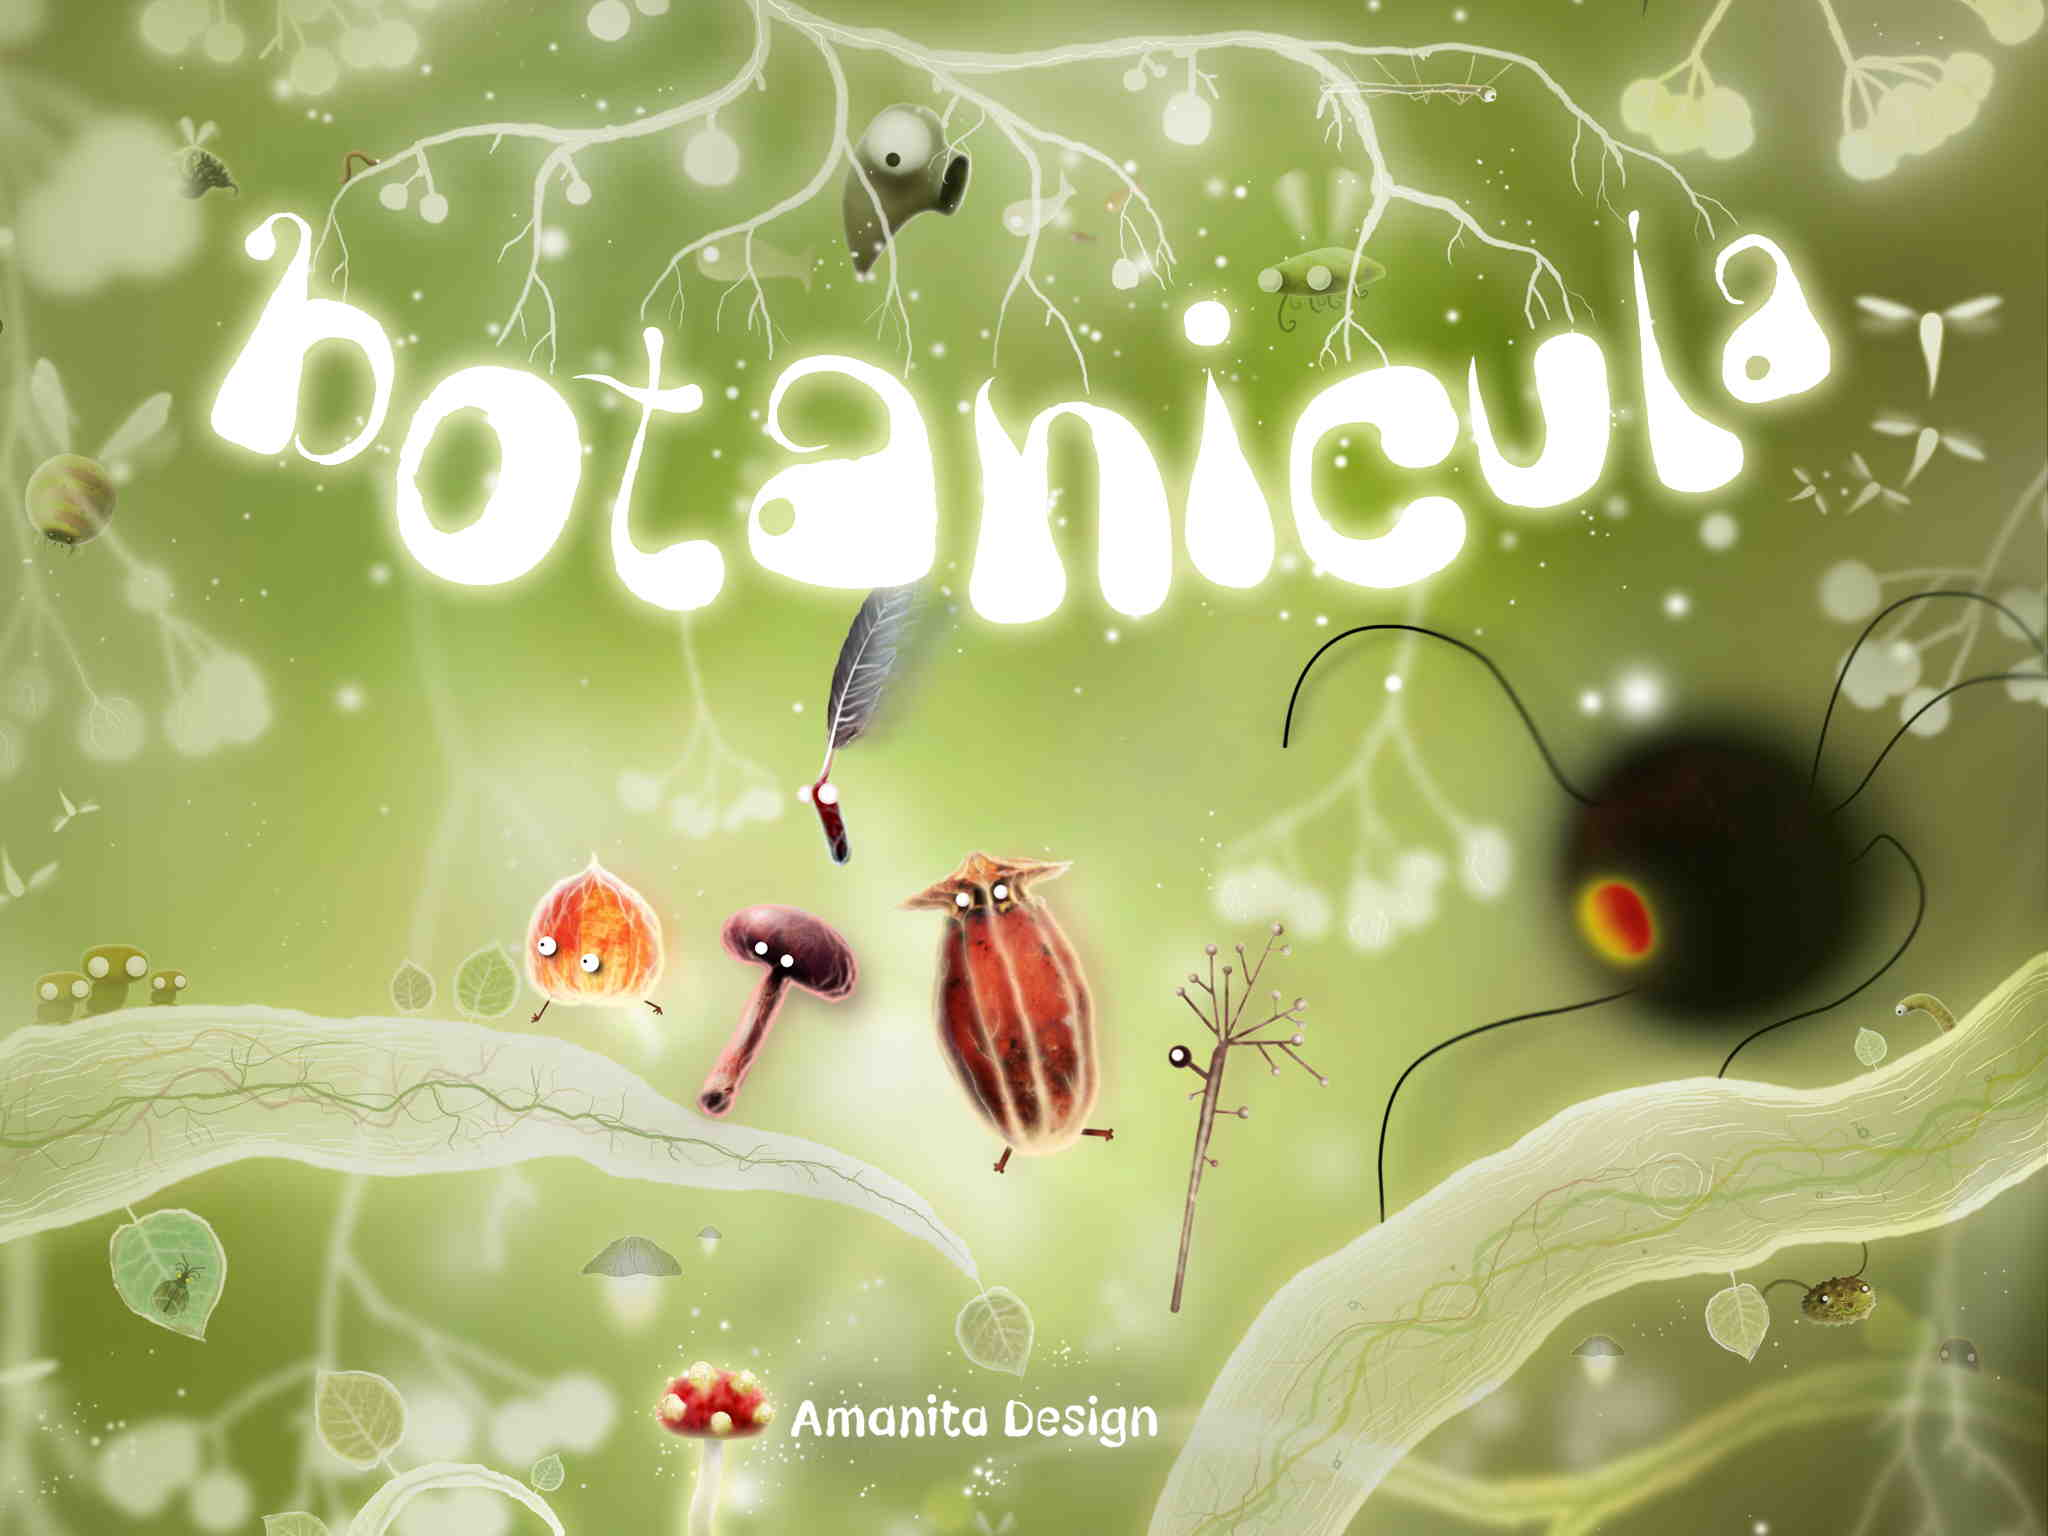 Botanicula_01